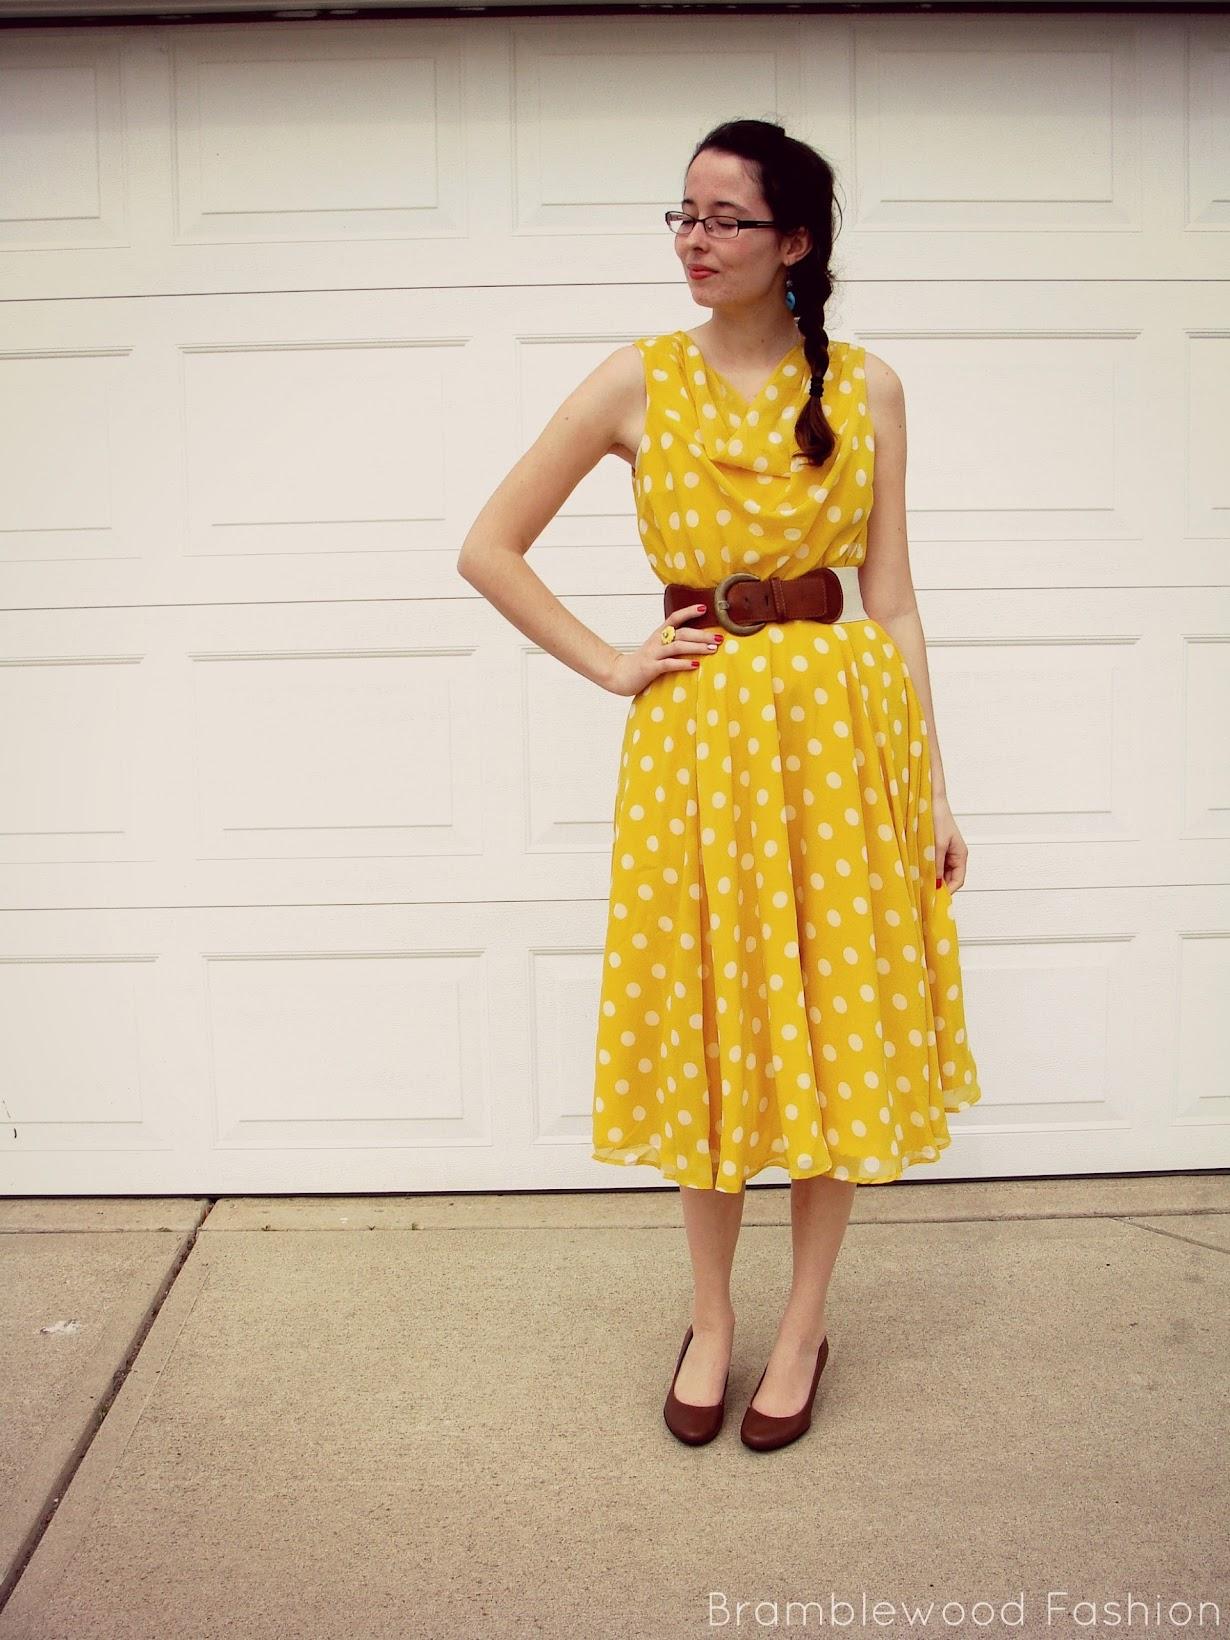 ff322c0d669d6 Bramblewood Fashion | Modest Fashion & Beauty Blog: What I Wore ...